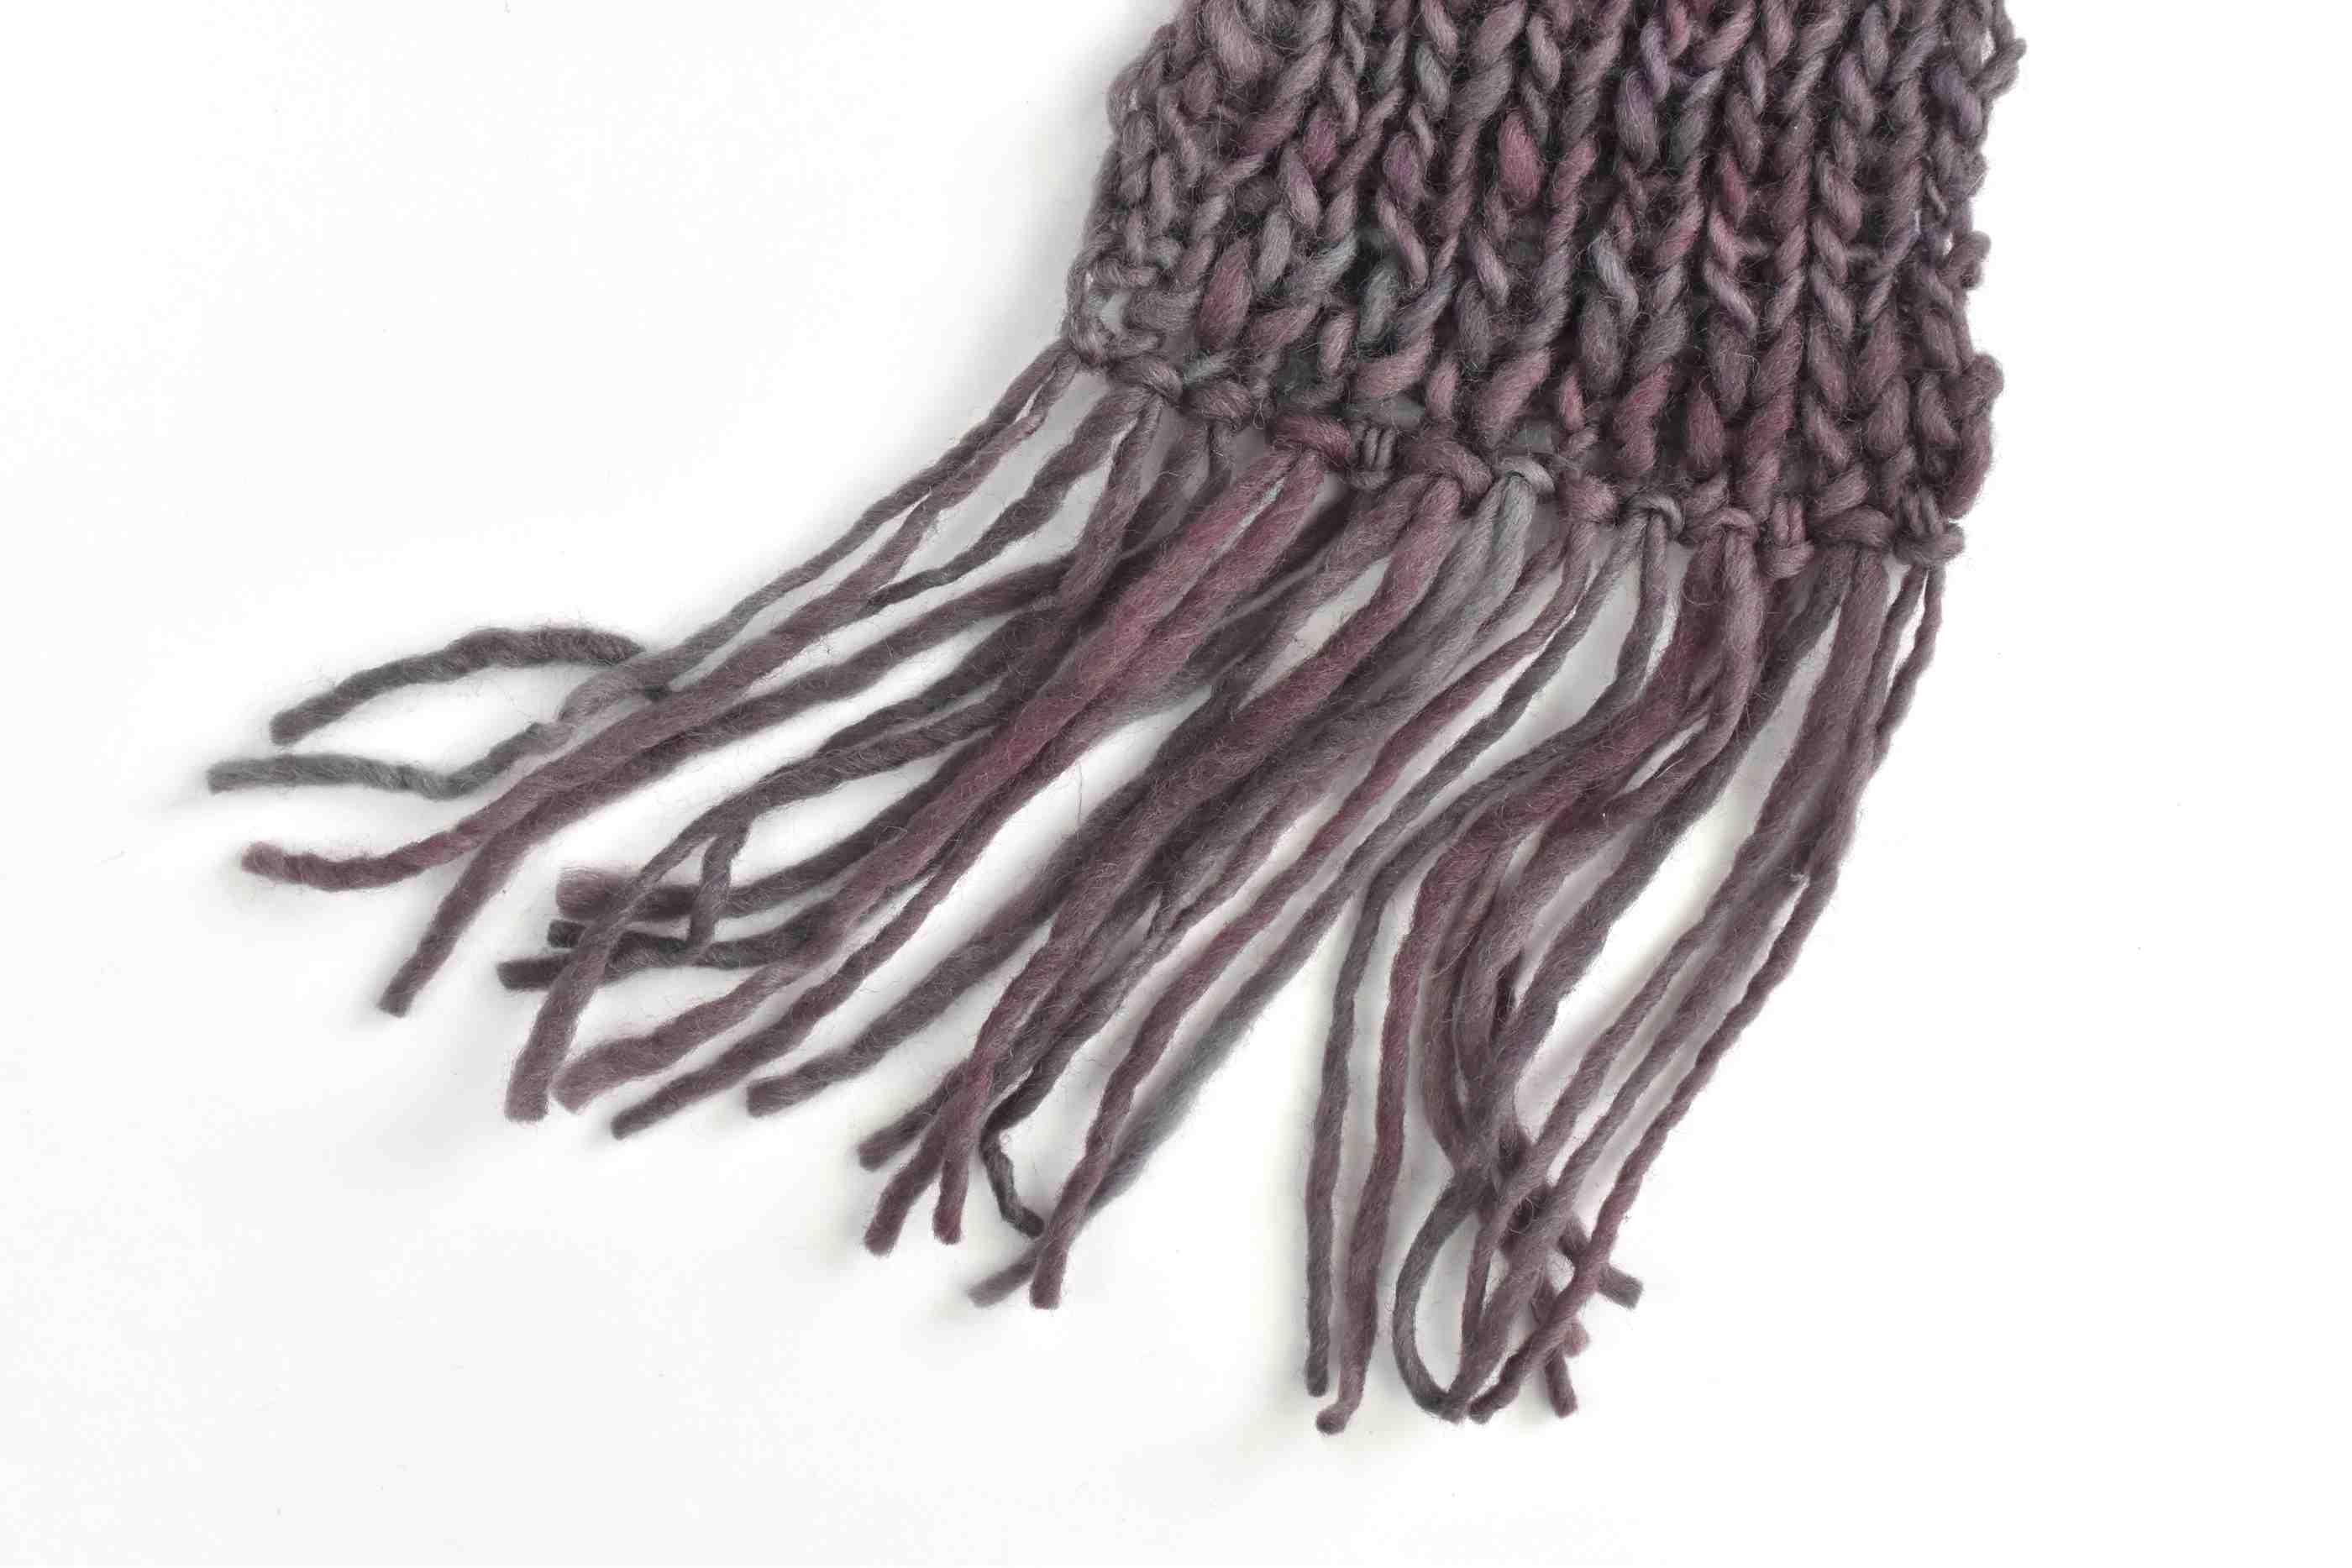 Finished fringe on knitted scarf